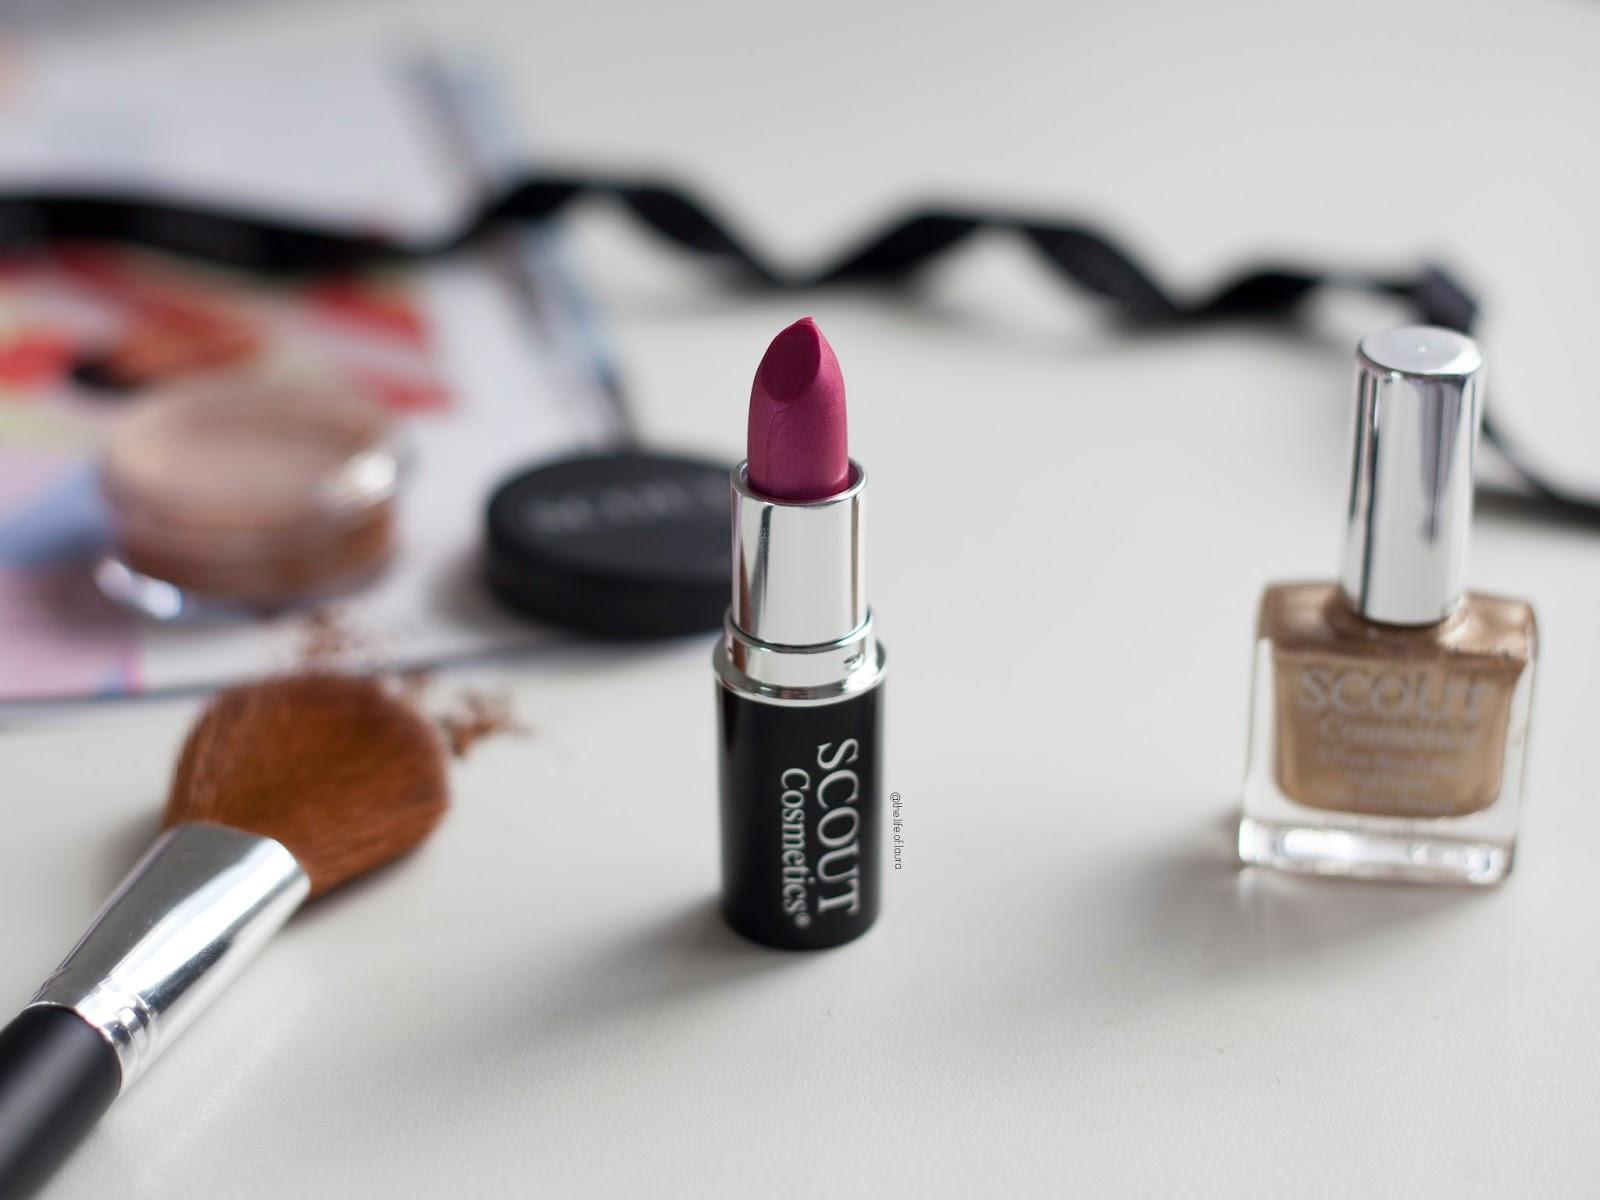 SCOUT Cosmetics Bronze Goddess Lipstick